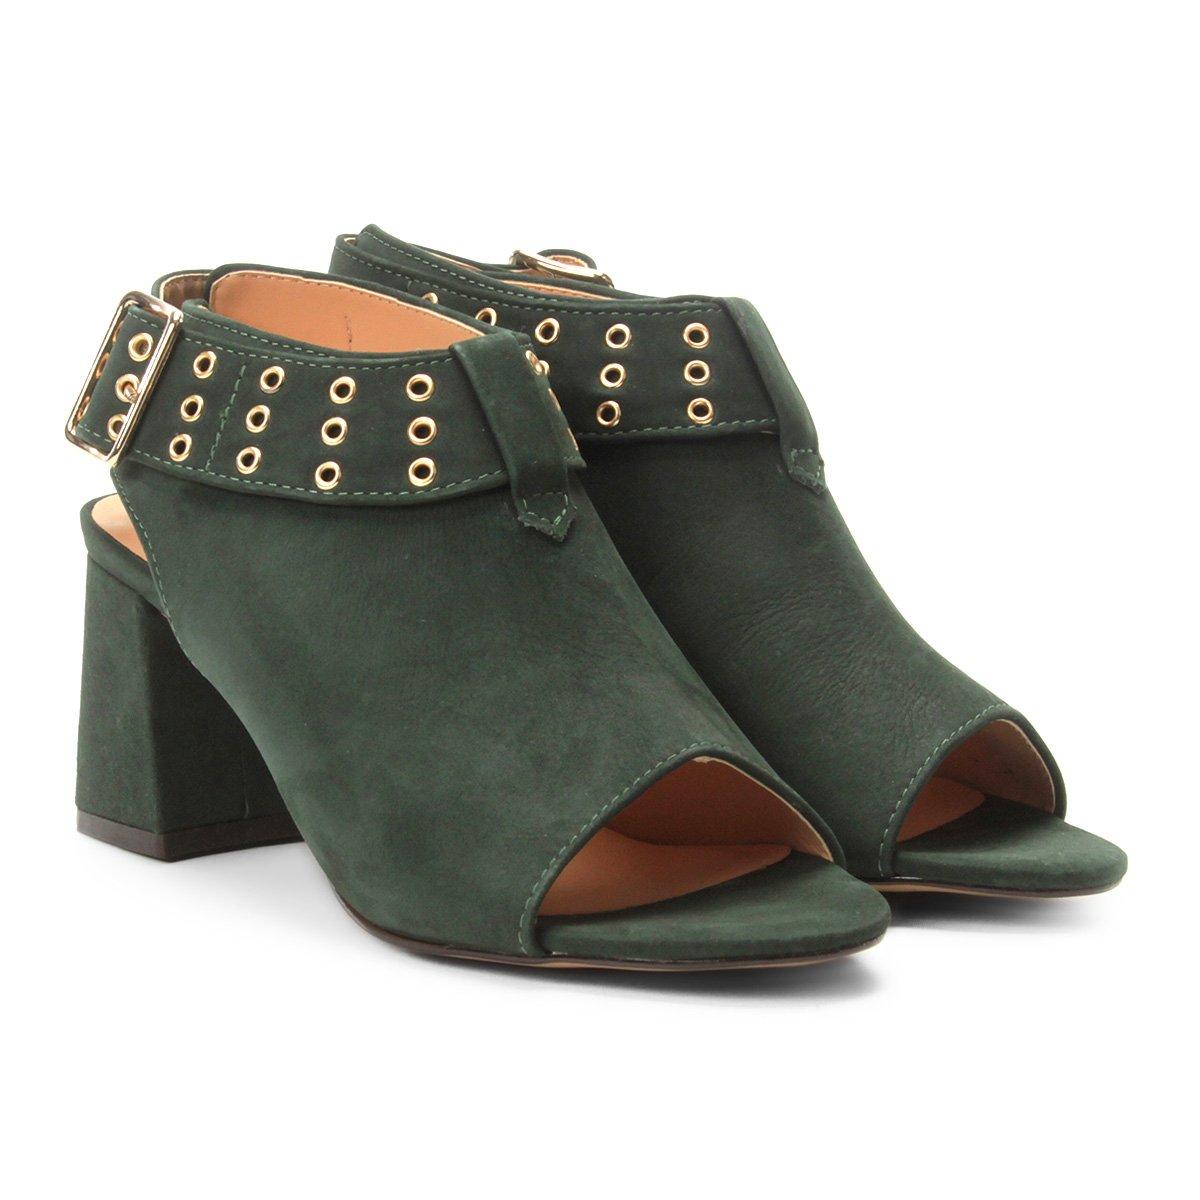 4483df2d75 Ankle Boot Couro Mezzo Punto Salto Bloco